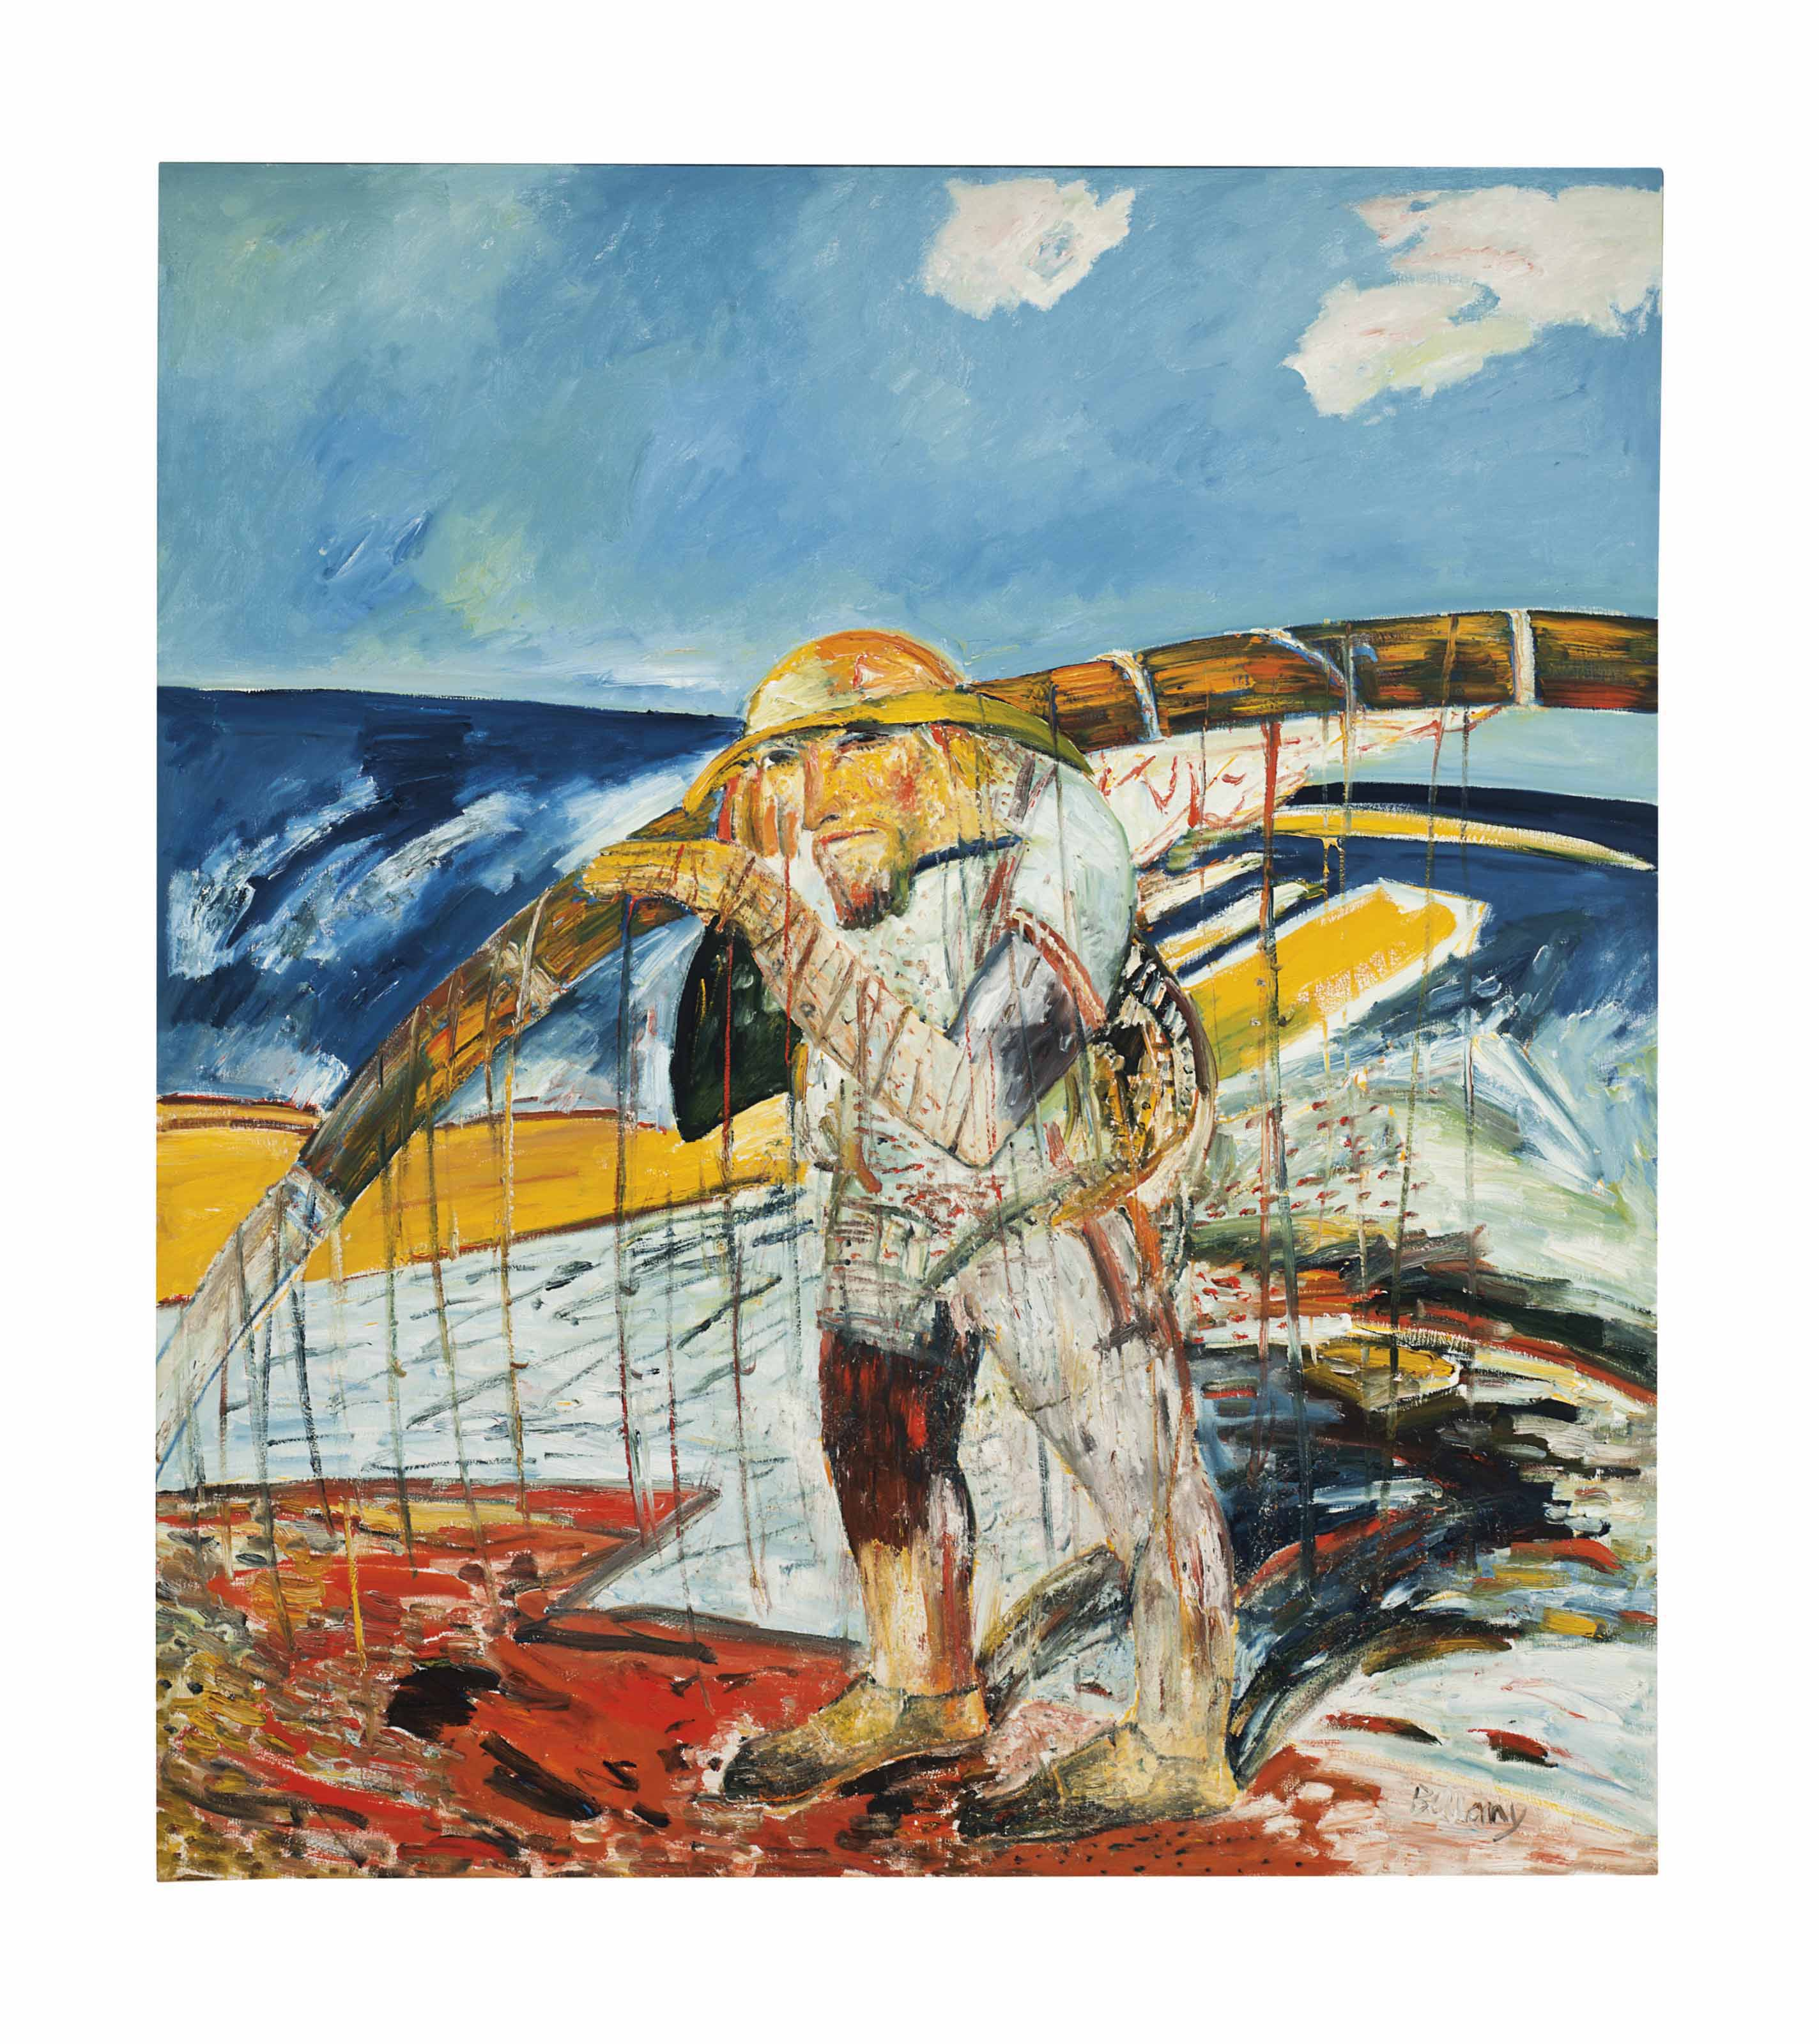 John Bellany (Scottish, 1942-2